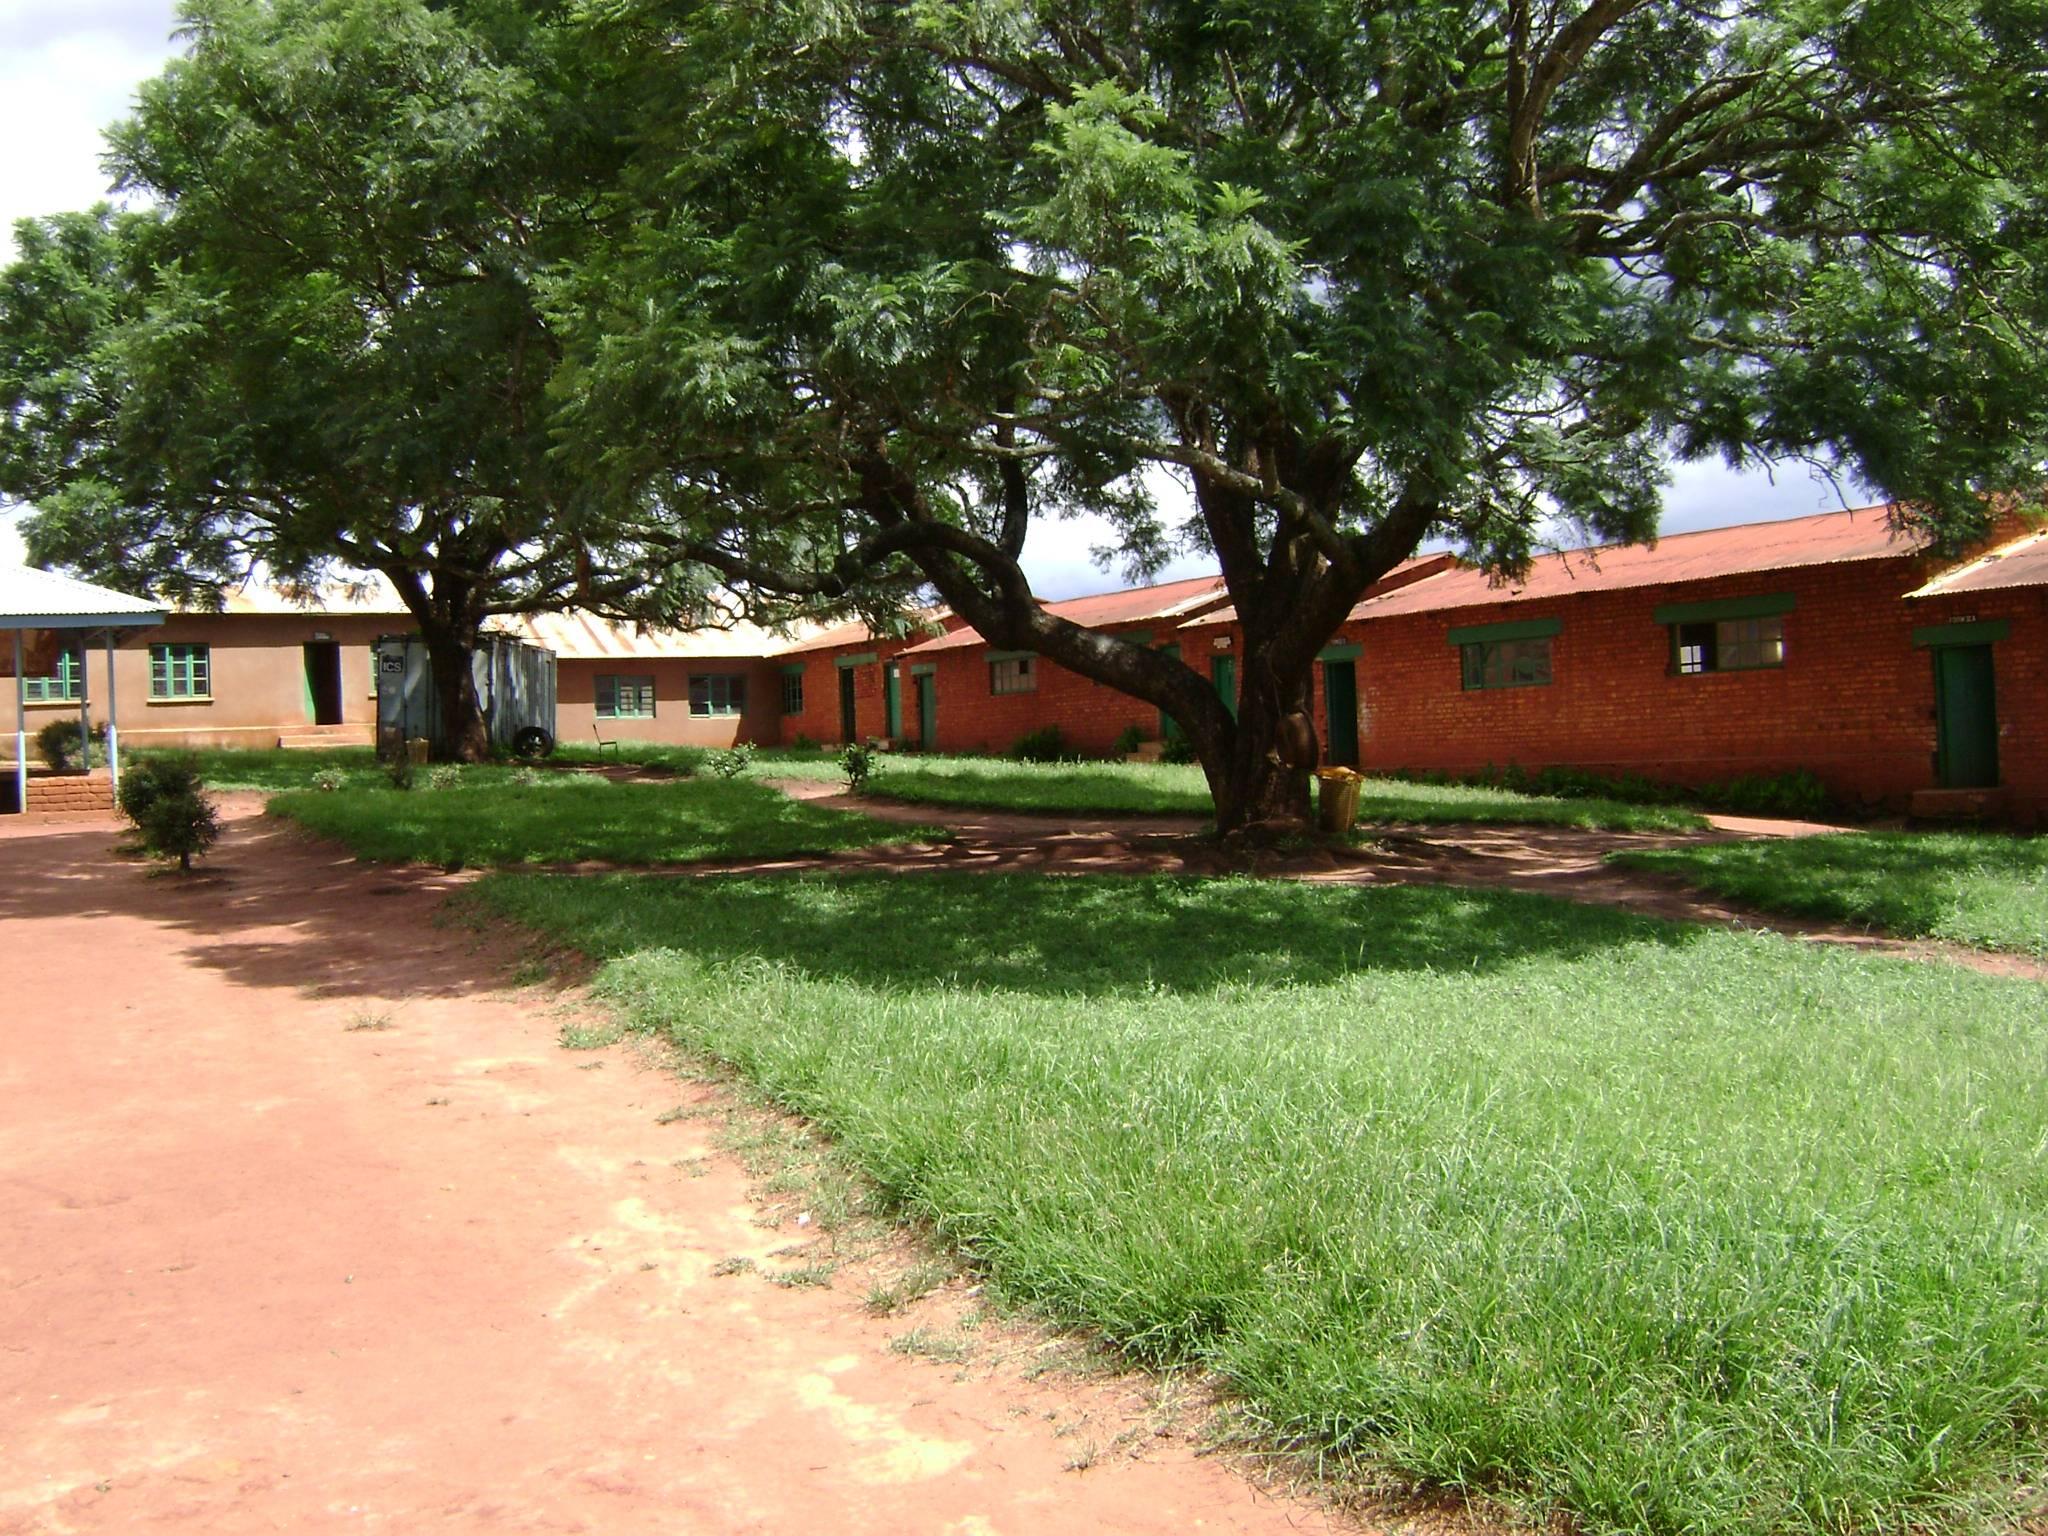 Right side of school courtyard